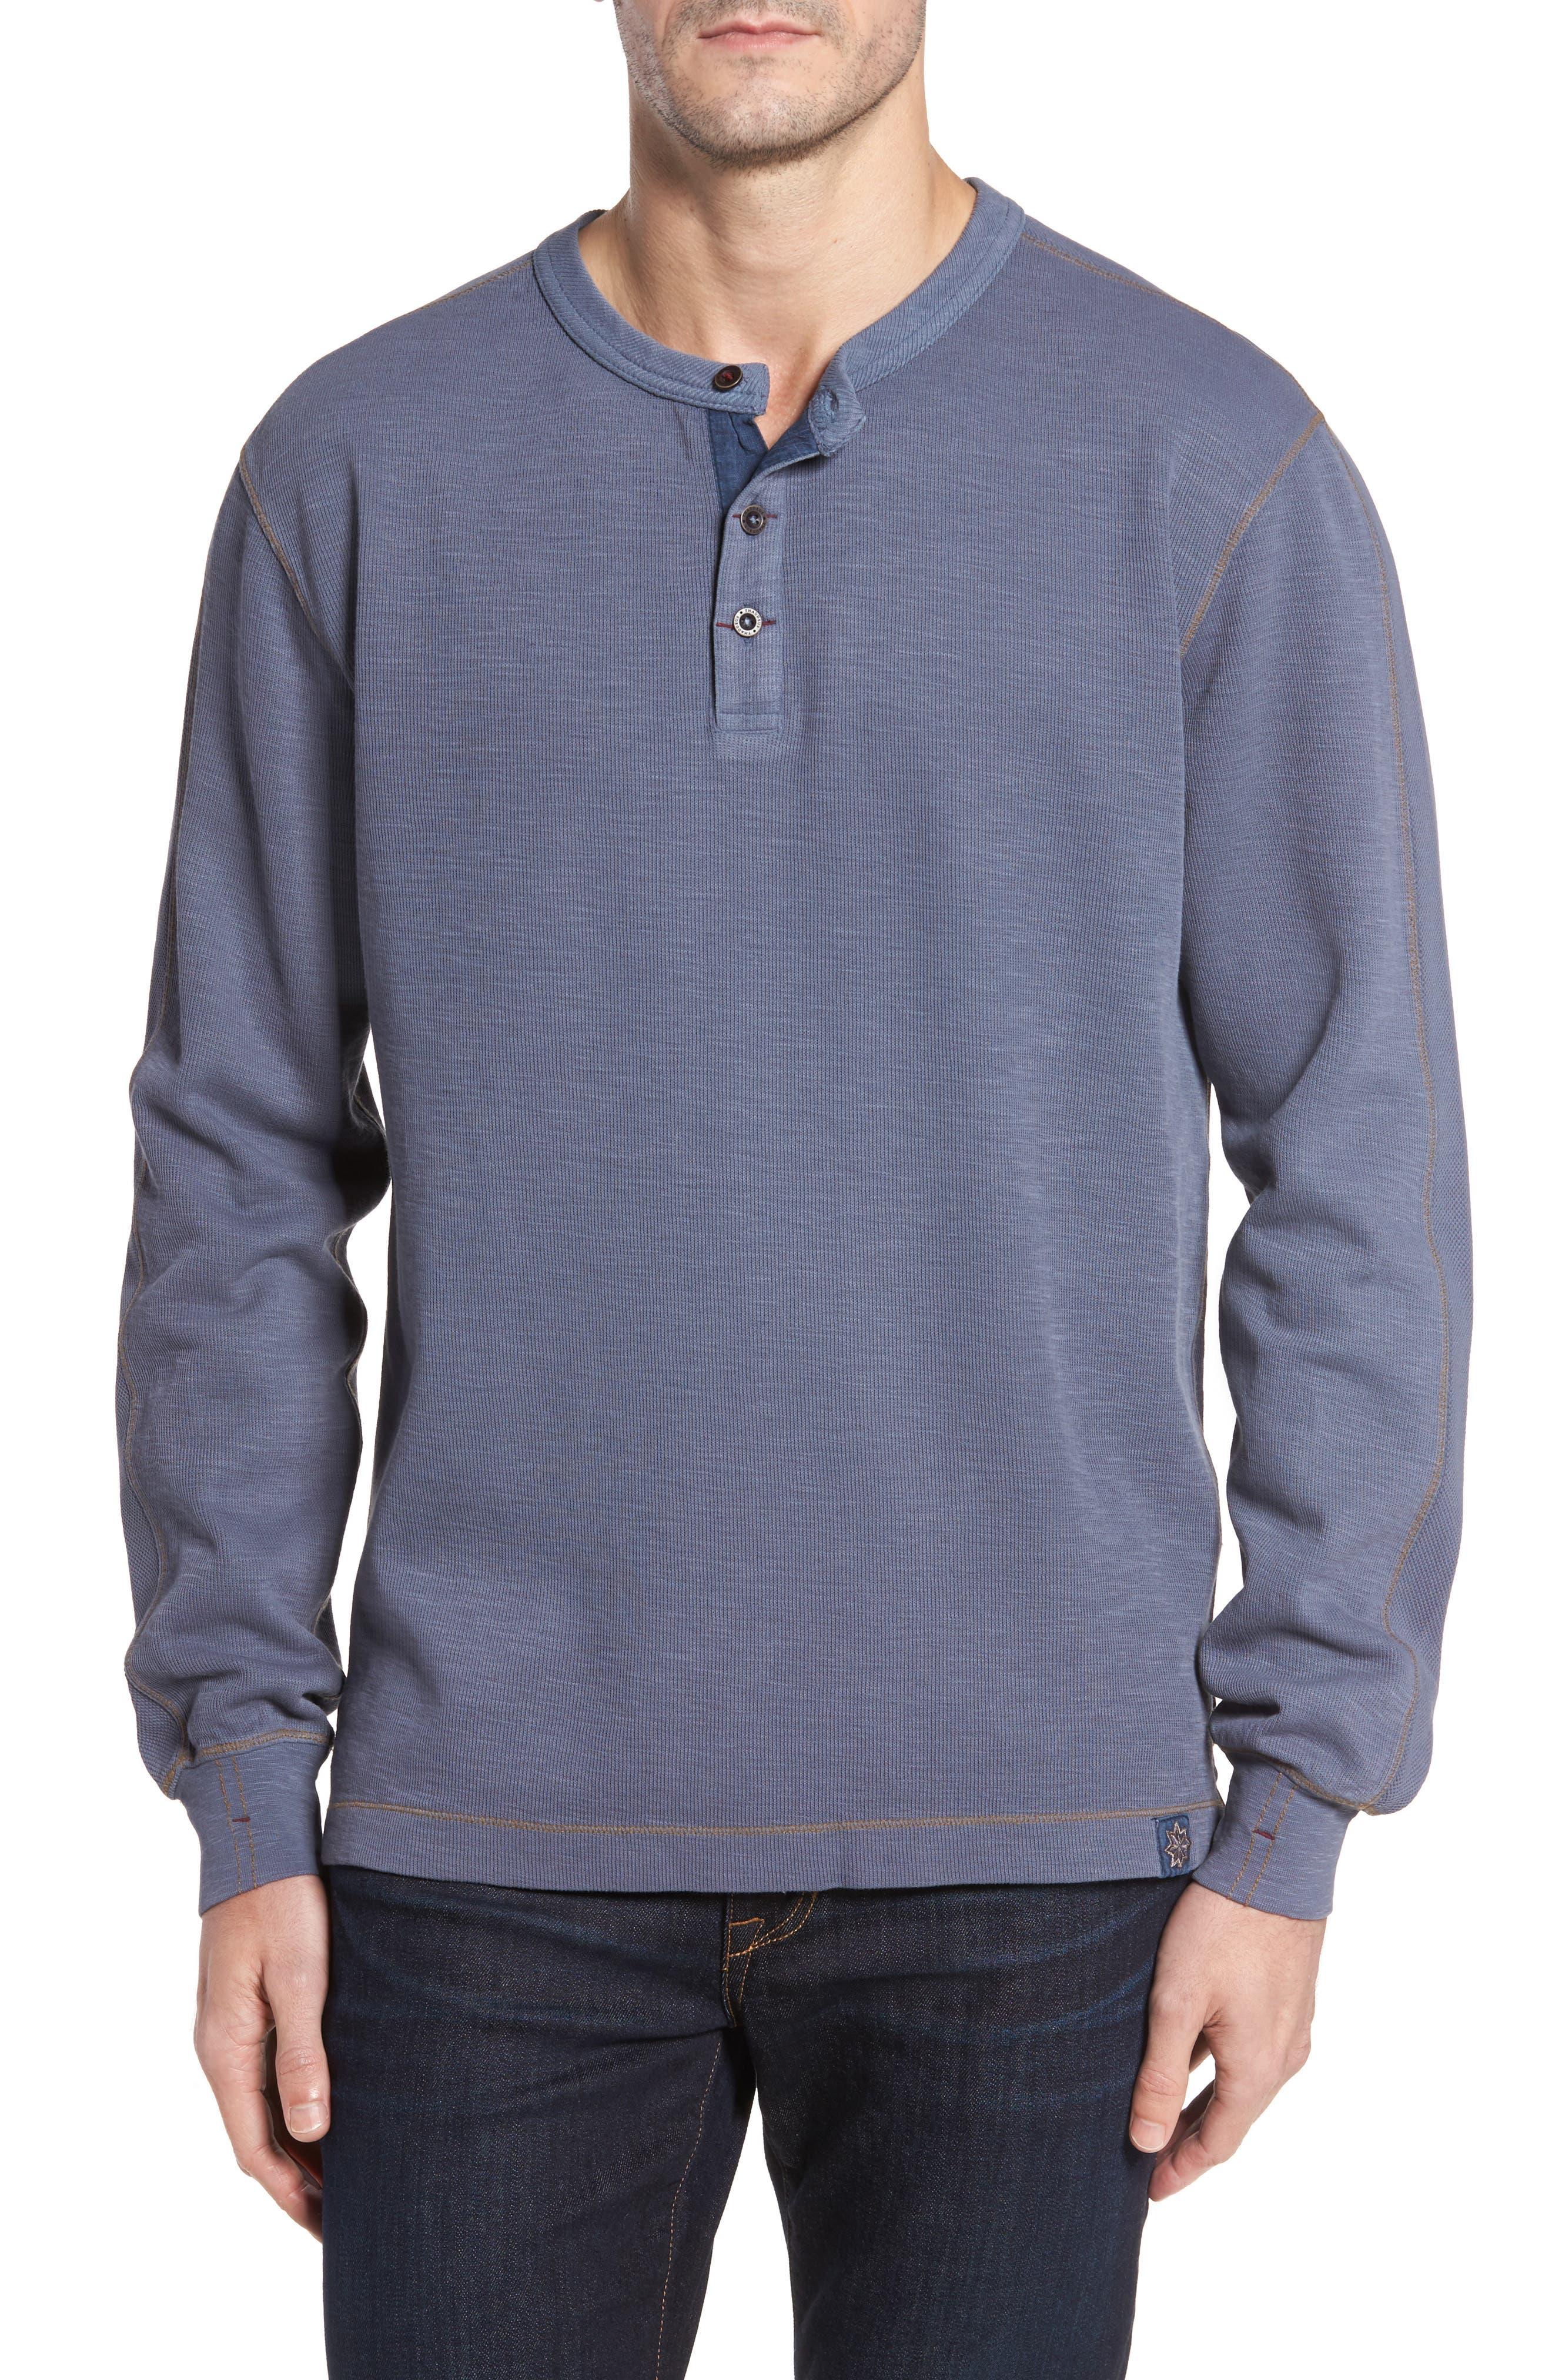 Hans Long Sleeve Henley T-Shirt,                         Main,                         color, 014